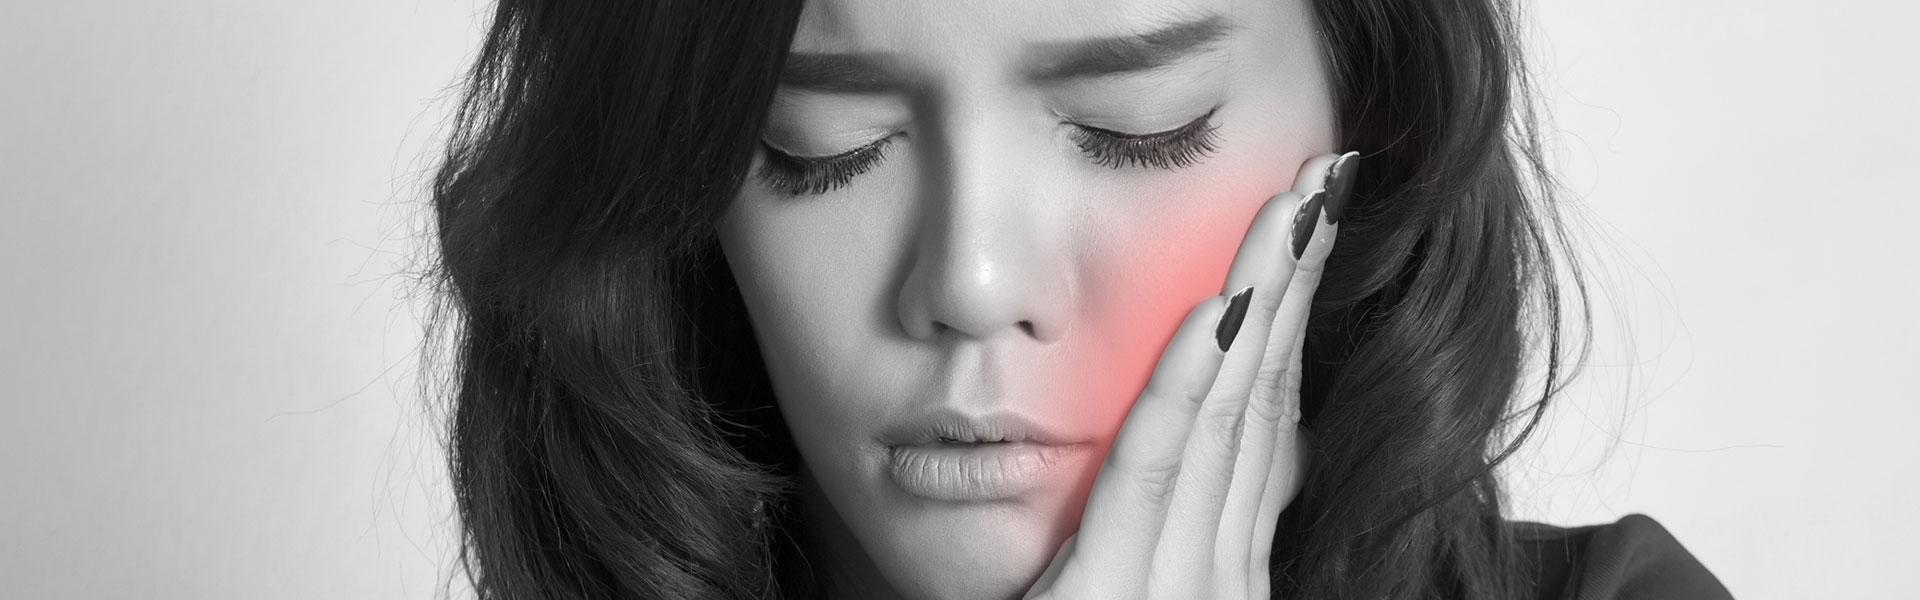 A girl having a dental emergency